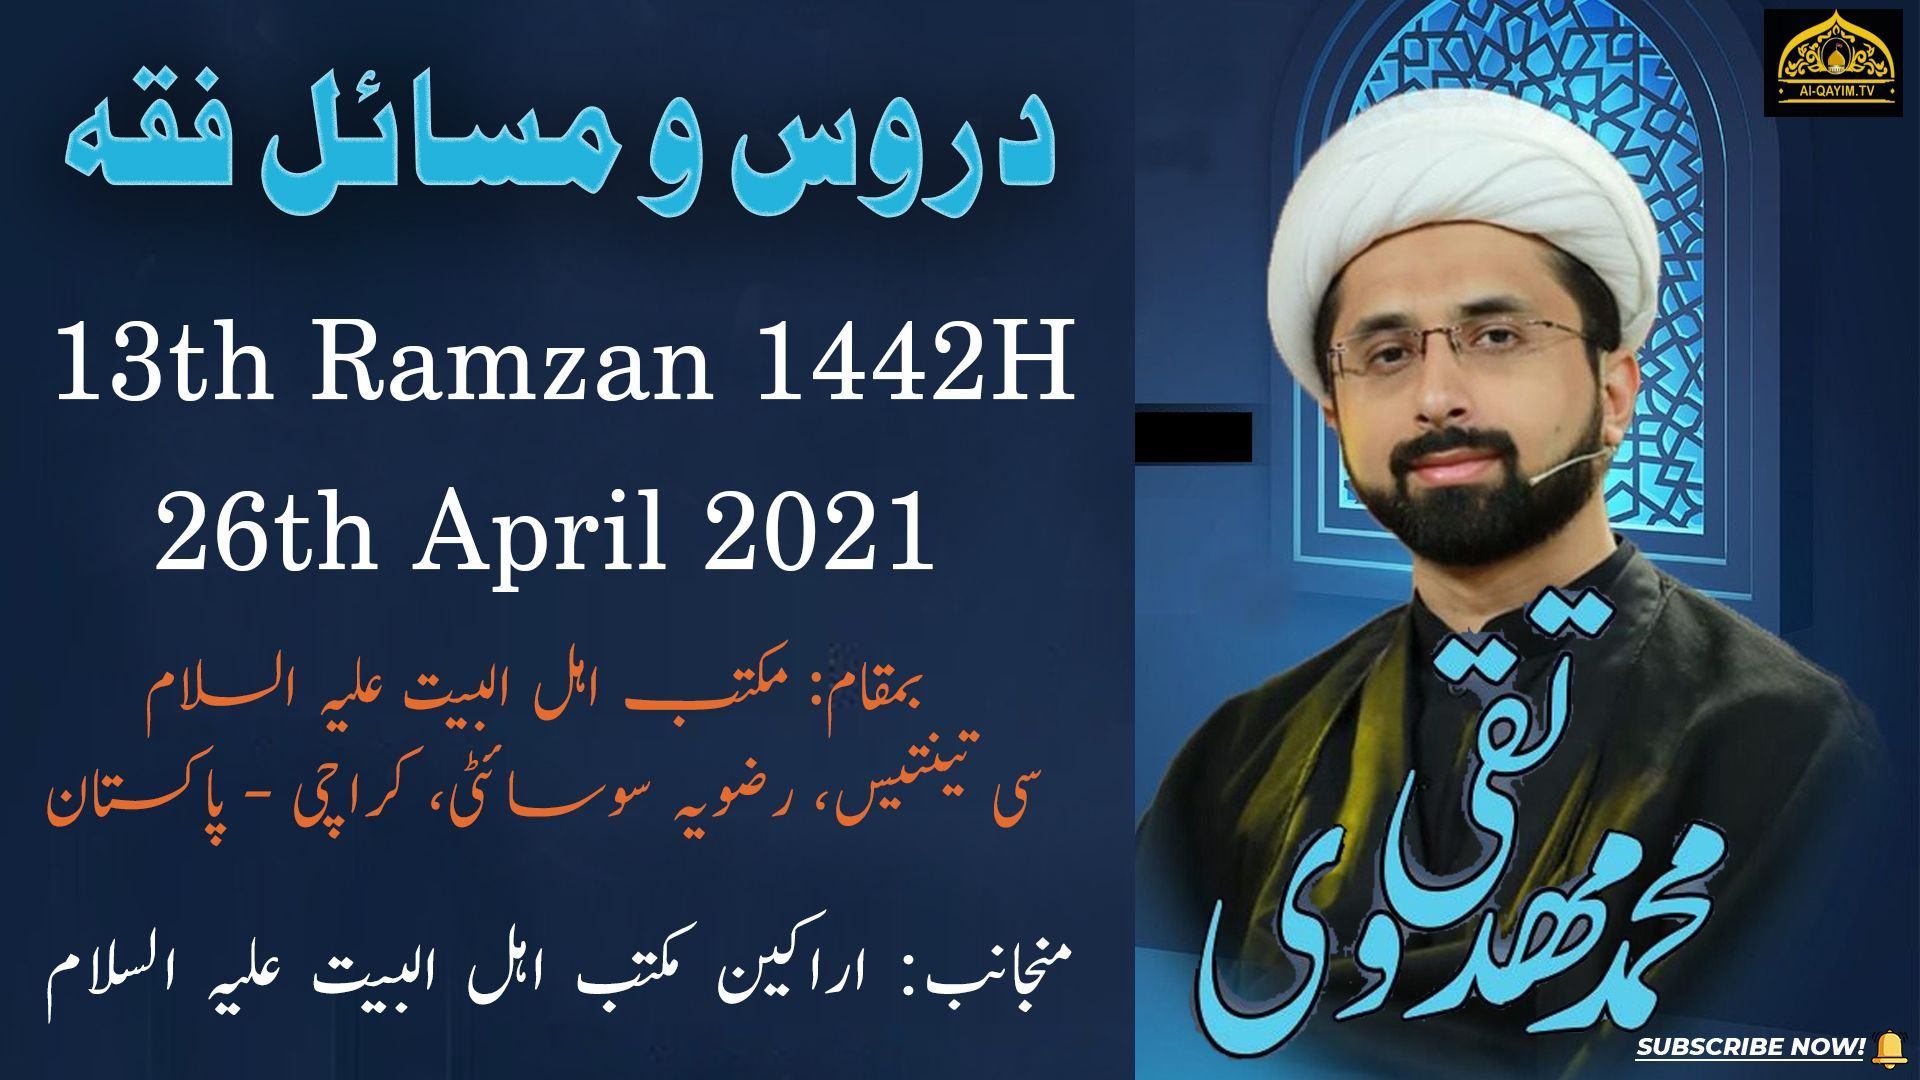 Moulana Muhammad Taqi Mehdavi | Dars Wo Masail Fiqae | 13th Ramzan 2021 | Maktab-e-Ahlebait, Karachi